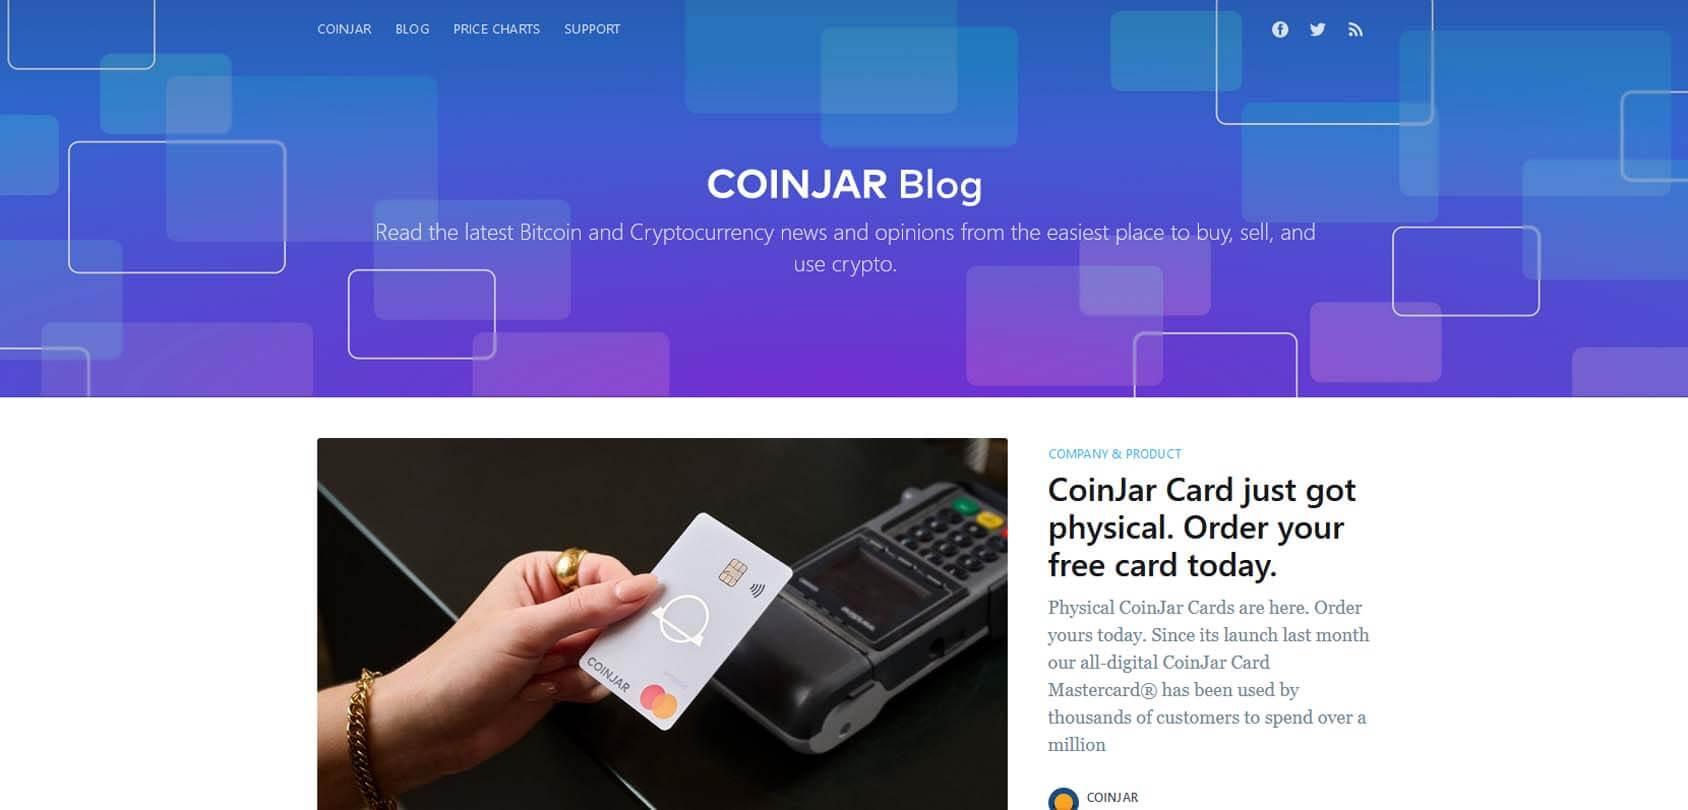 CoinJar Blog Homepage